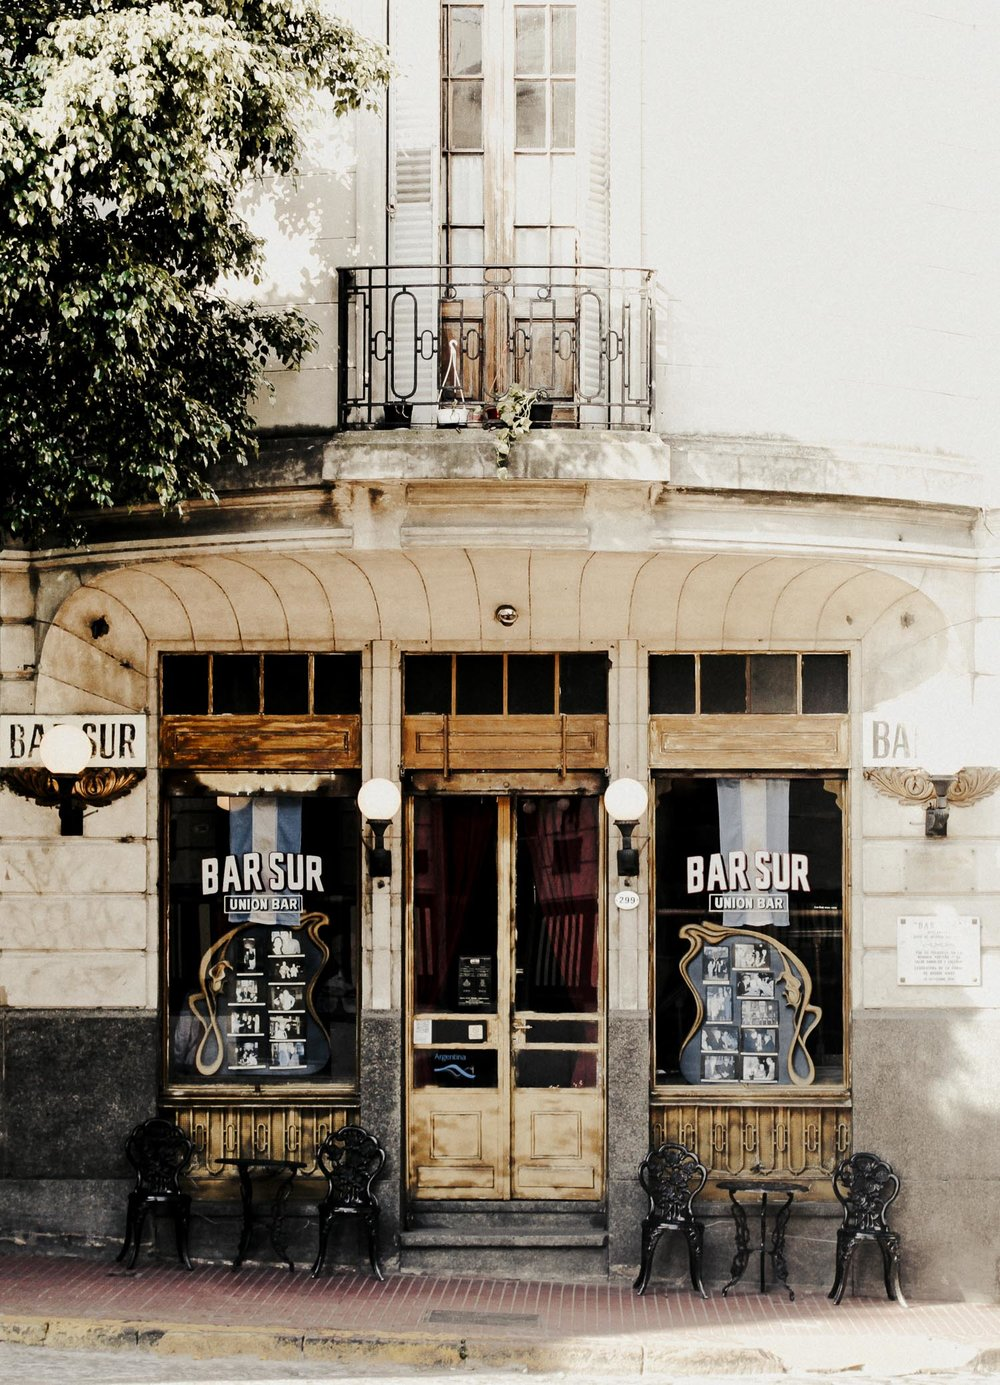 Bar Sur. San Telmo, Argentina 2015.